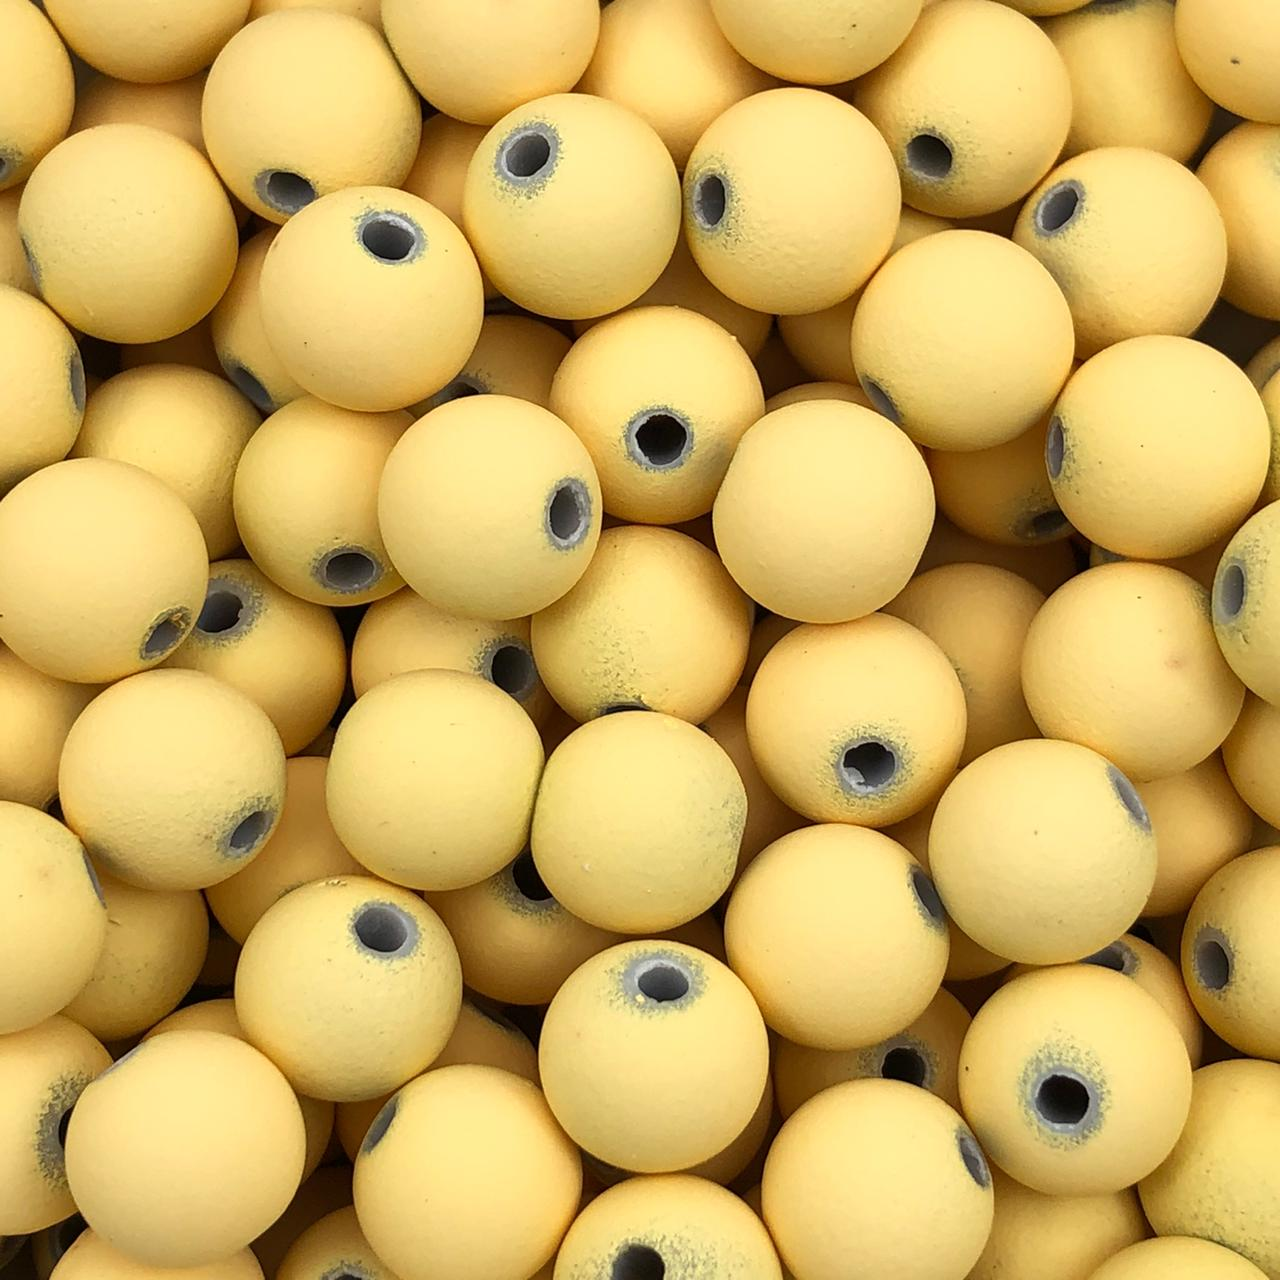 BOL613 - Bola Emborrachada Amarelo Claro 10mm - 20Grs